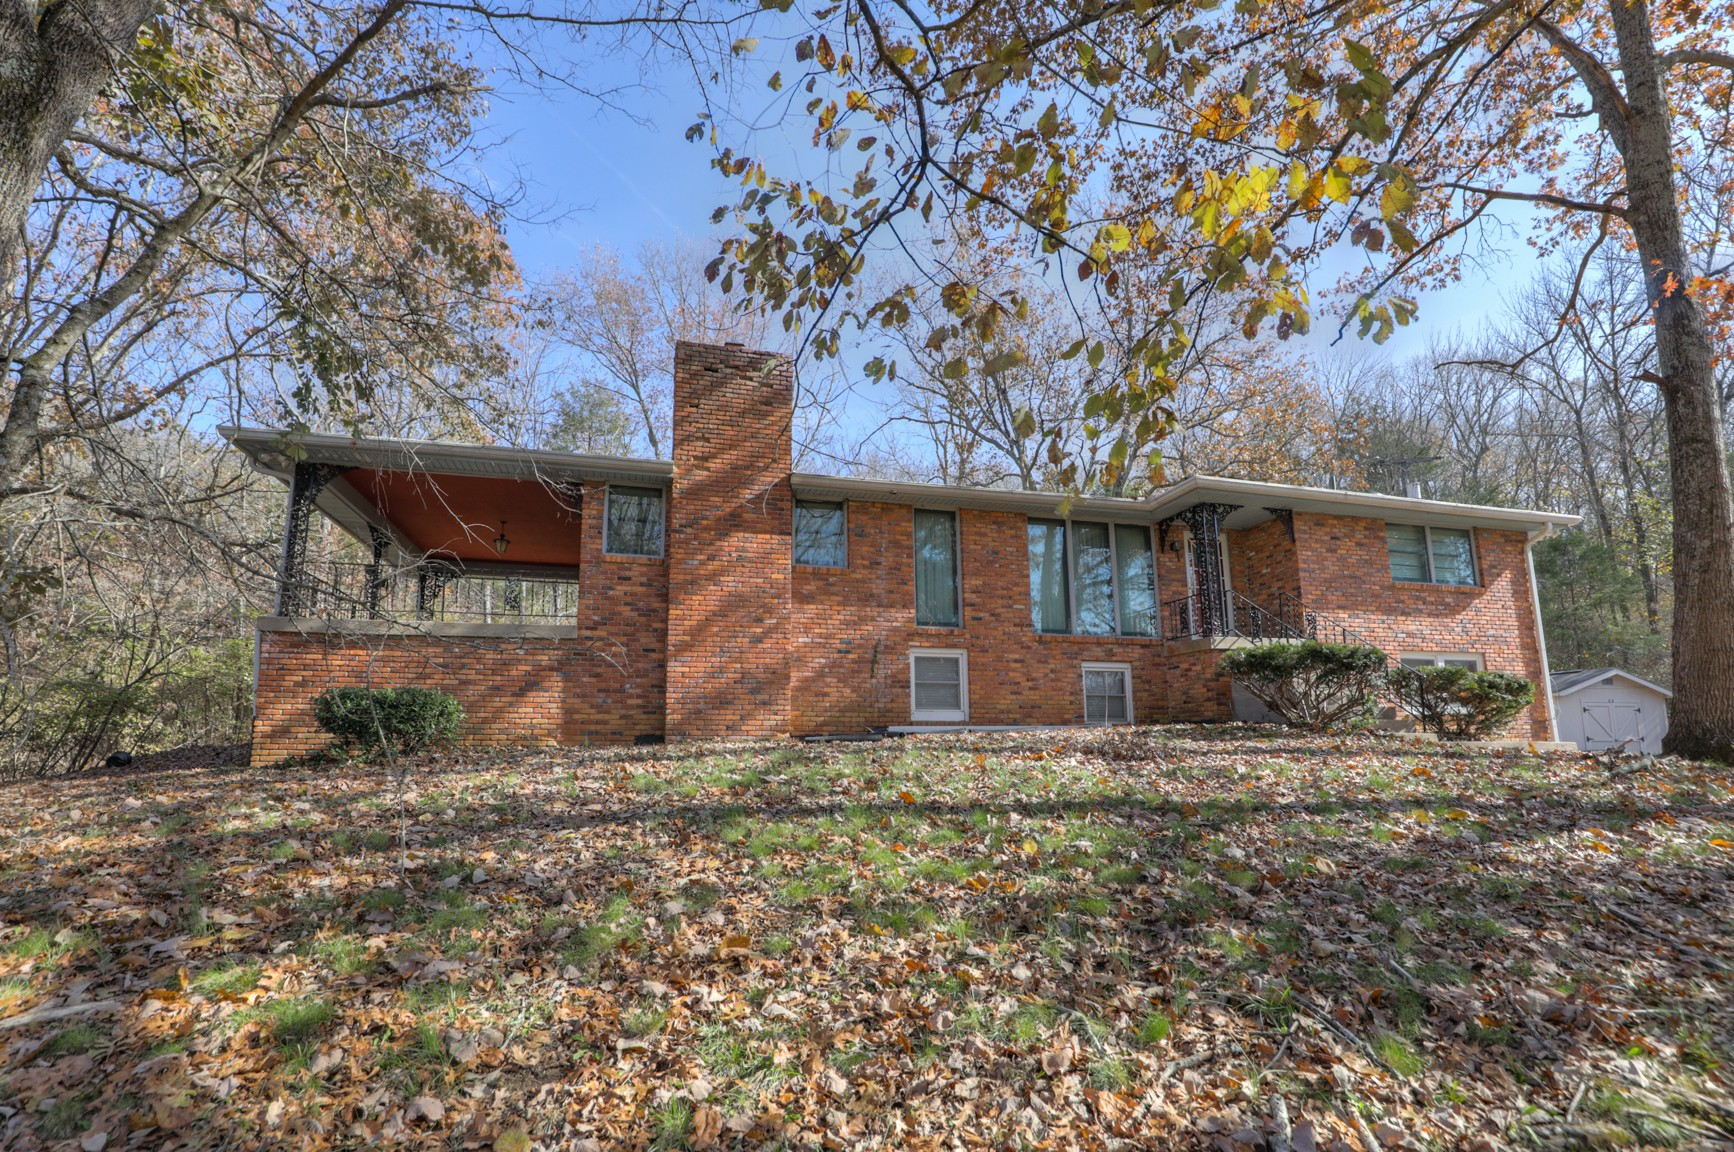 4558 Old Hickory Blvd, Nashville, TN 37218 - Nashville, TN real estate listing